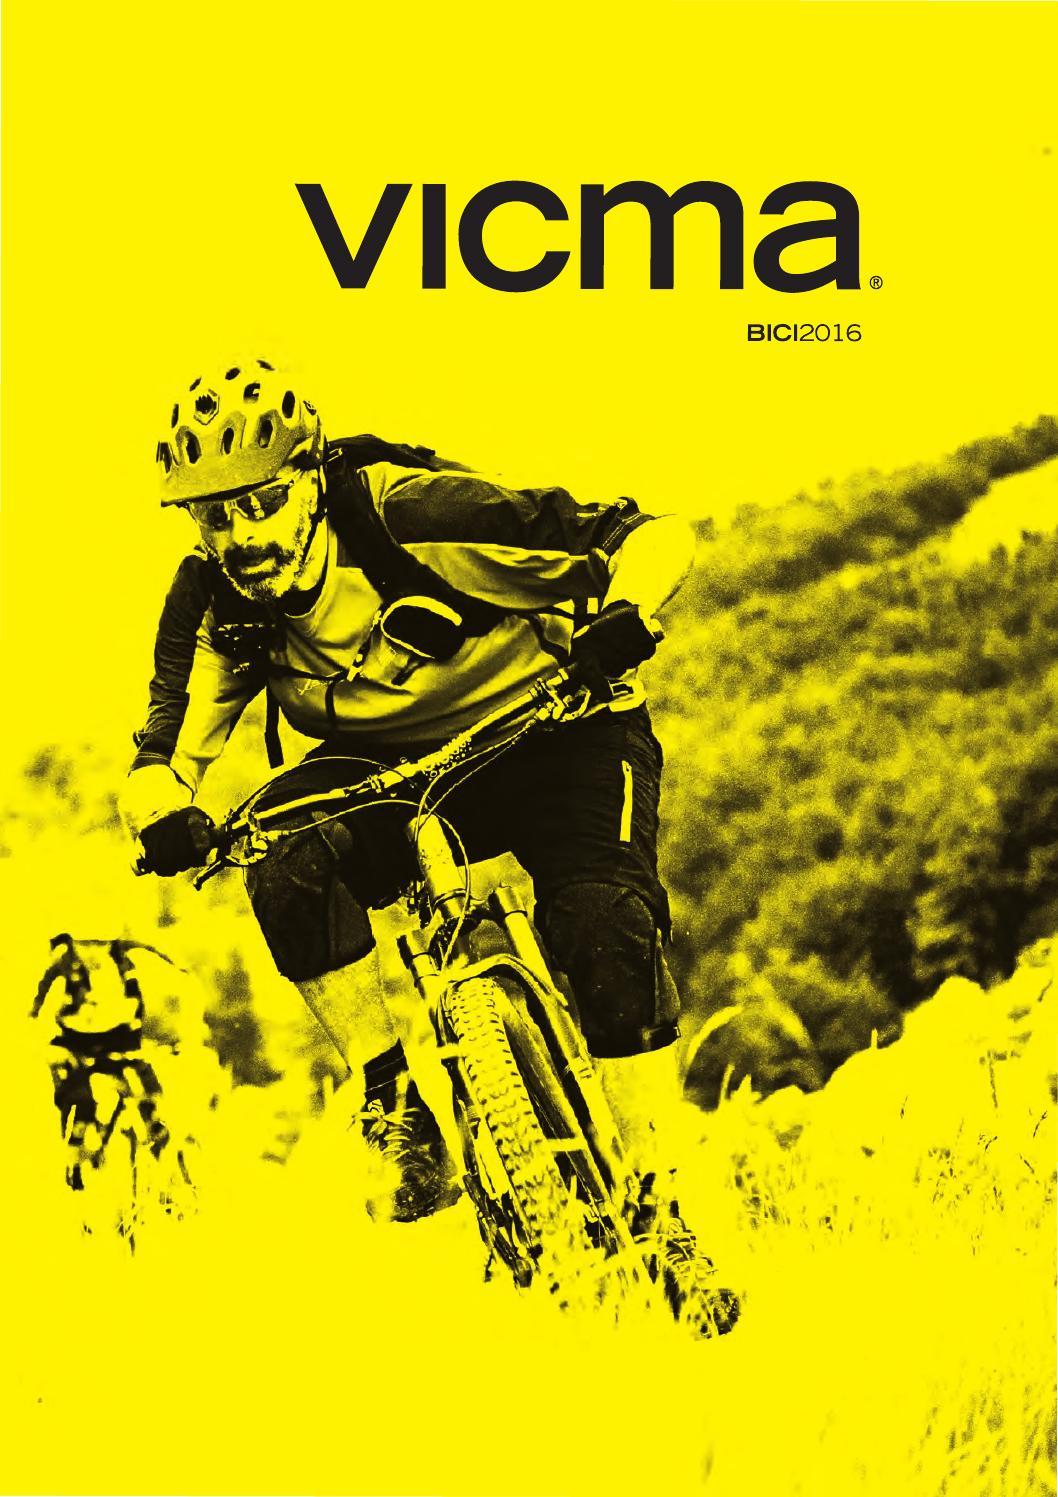 Vittoria Cub Talla /Única Negro Rubino IV 28-622 RIGIDA G2.0 Cubiertas Ciclismo Negro Adultos Unisex